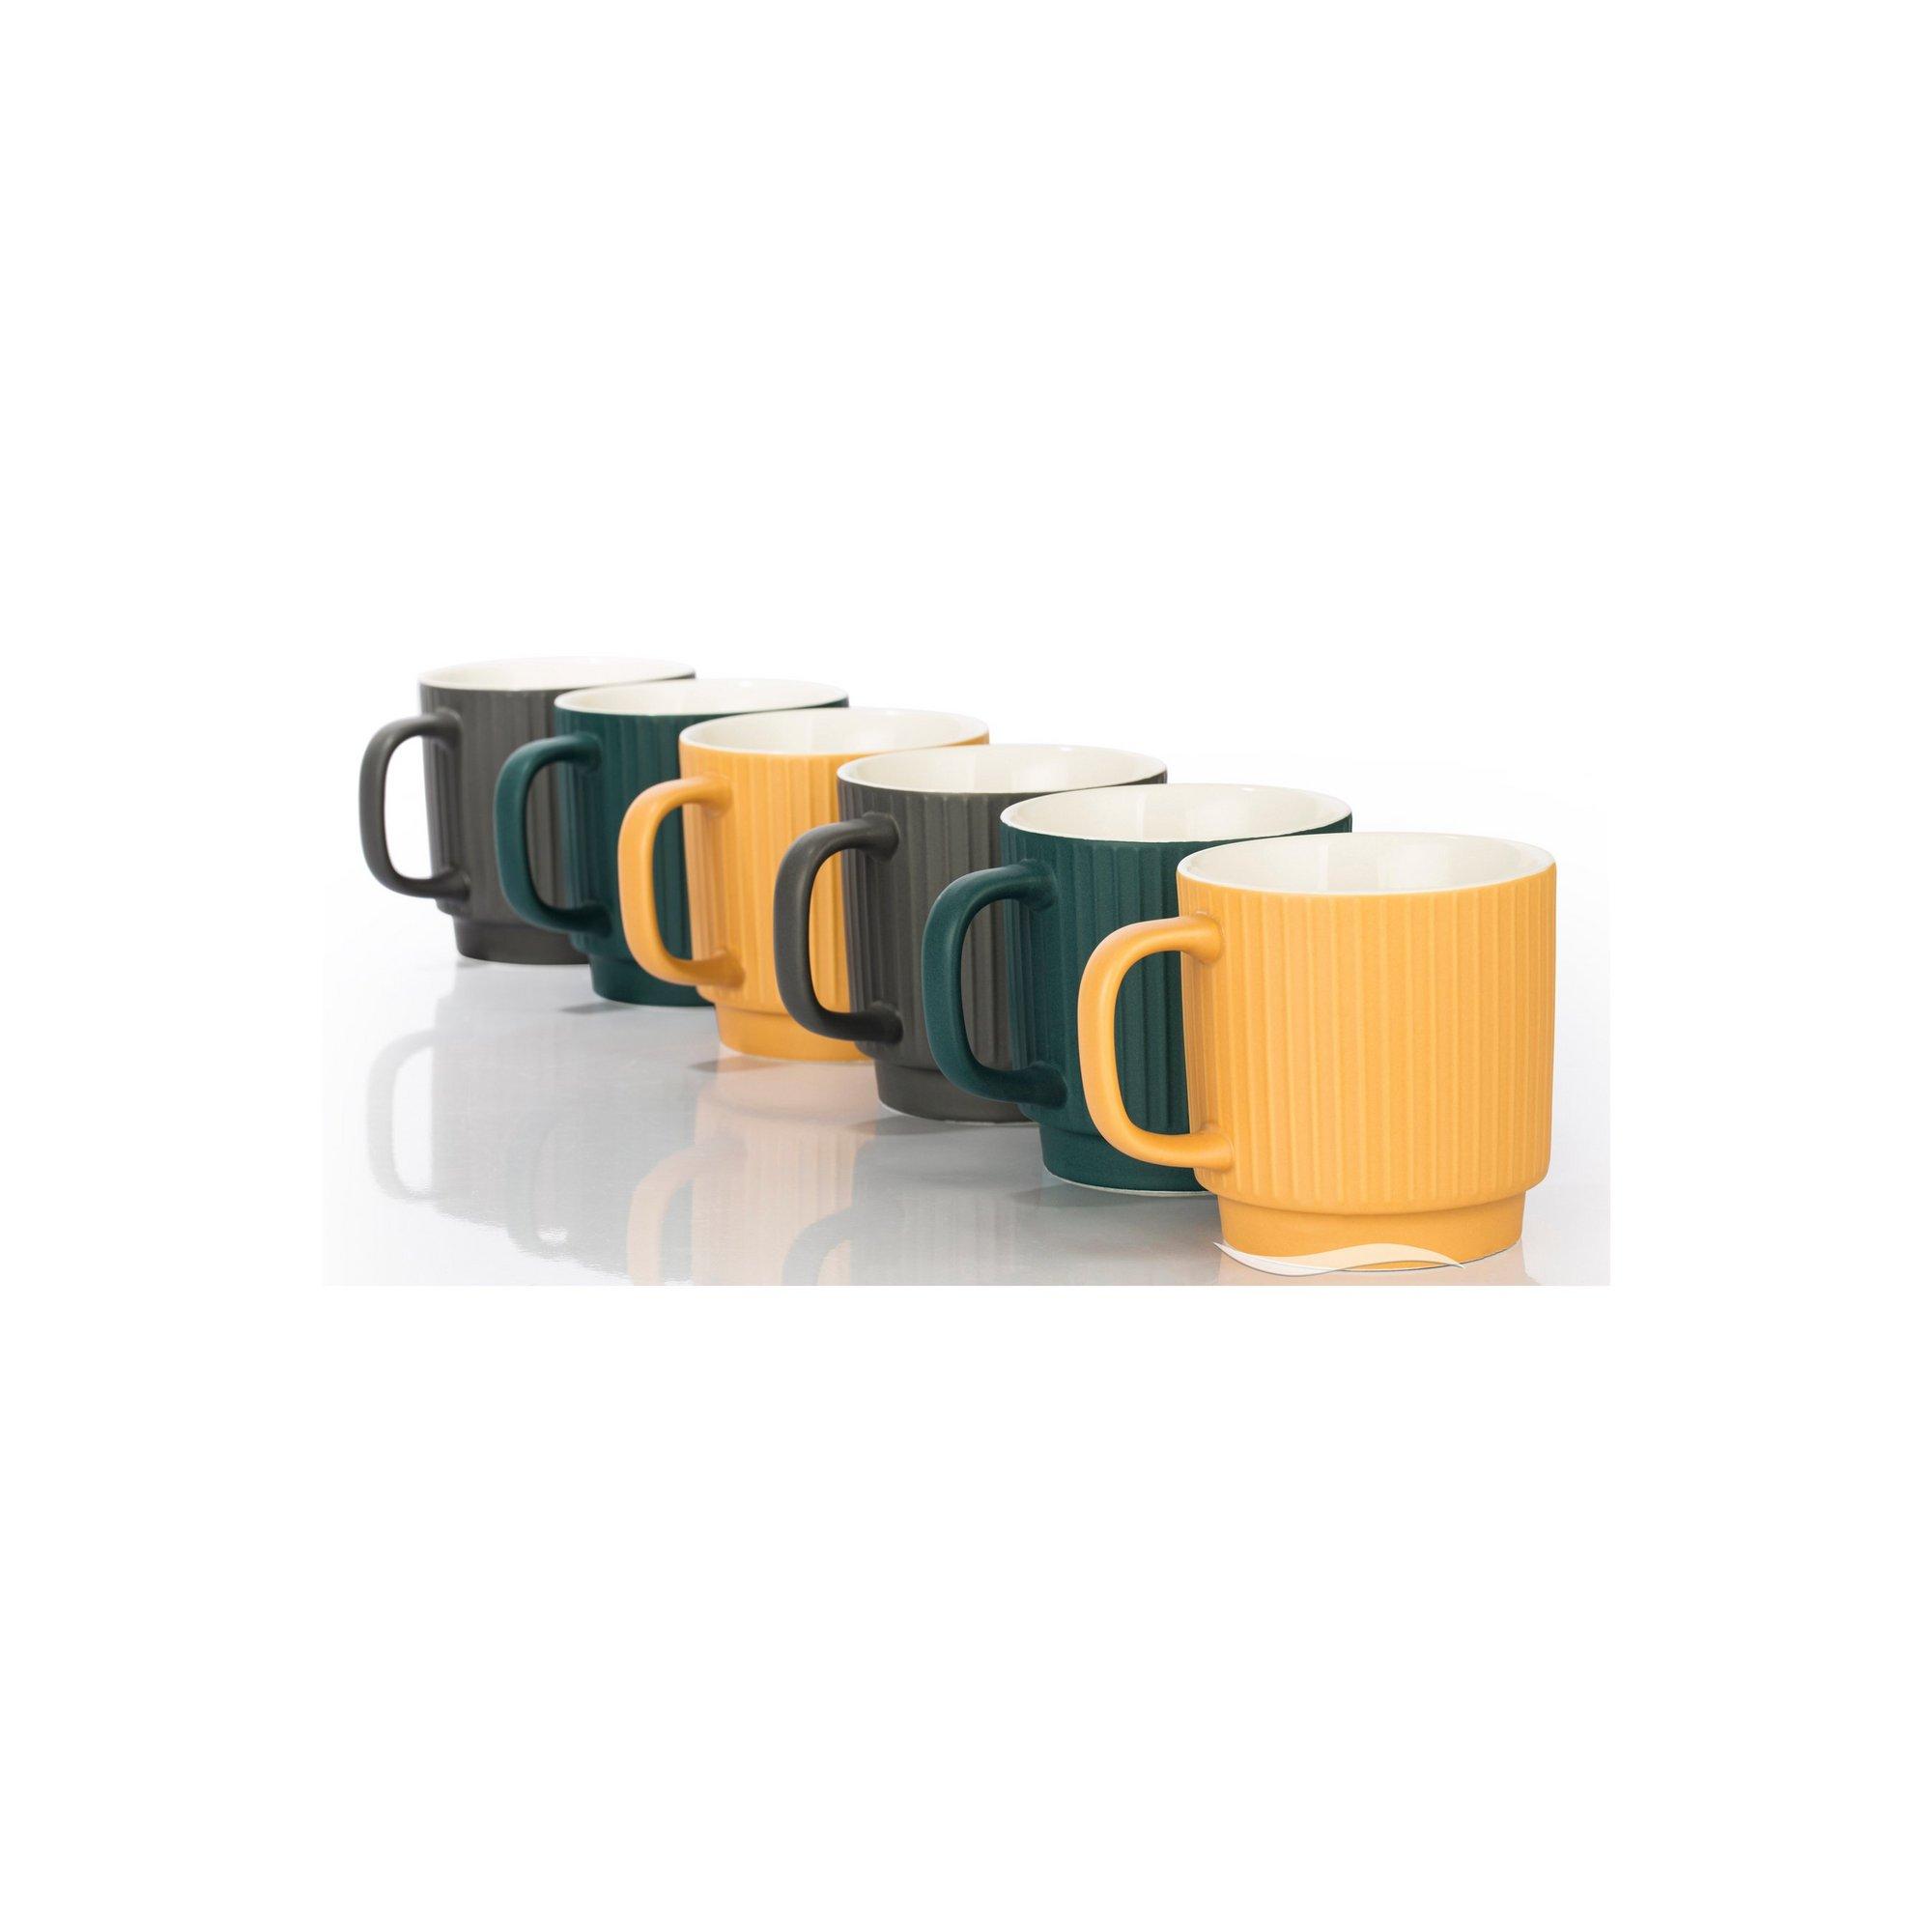 Image of 6 Piece China Matt Ribbed Mugs